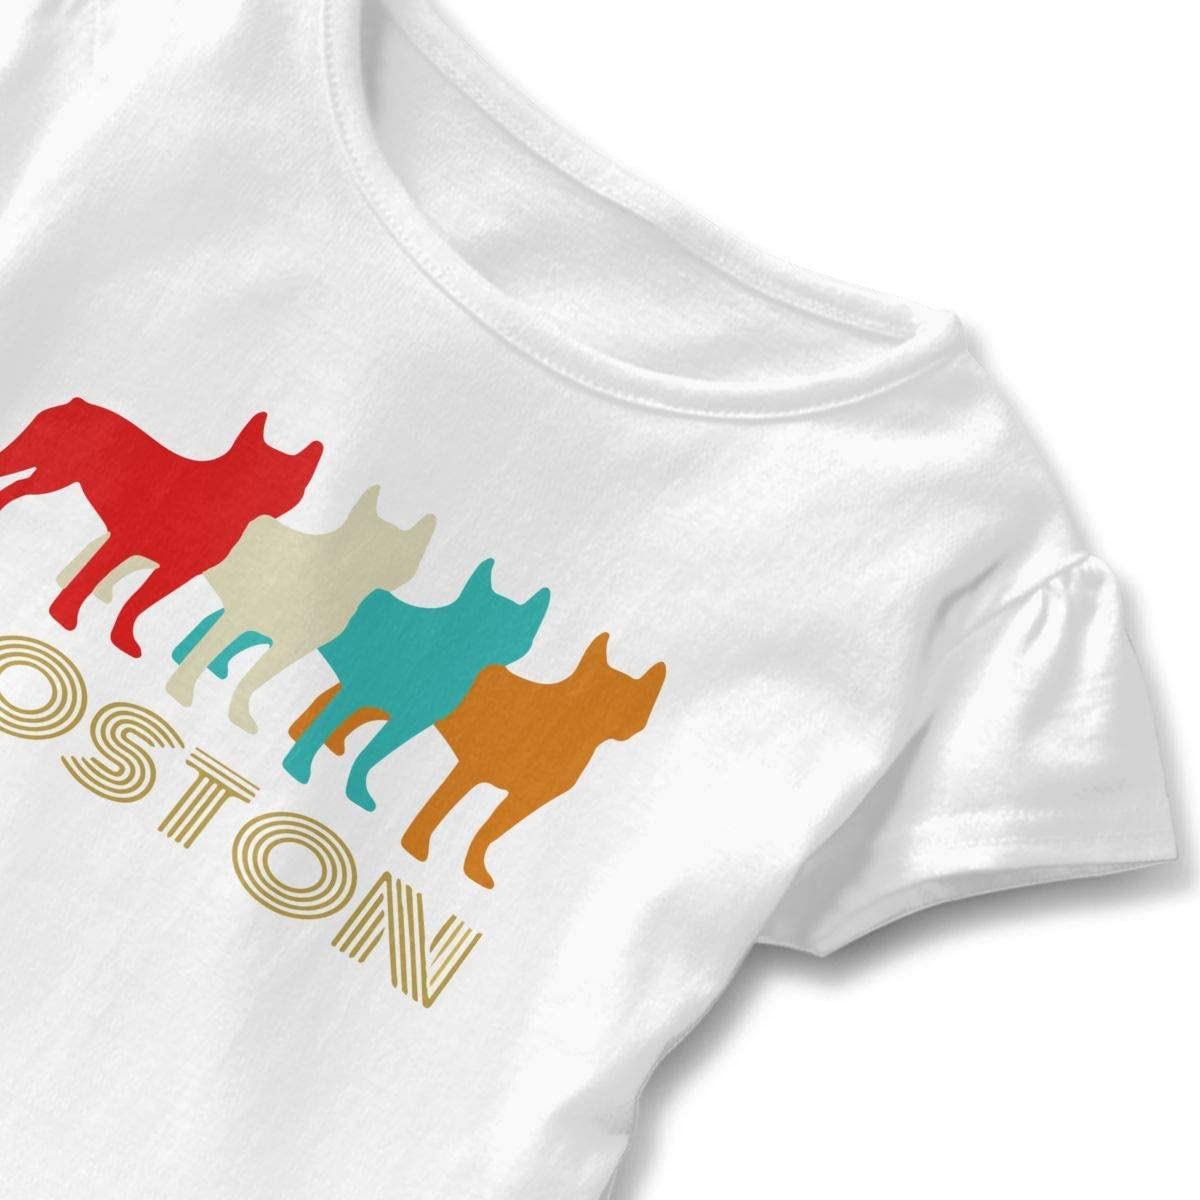 Vintage Boston Terrier Baby Girls Short Sleeve Shirt Clothes